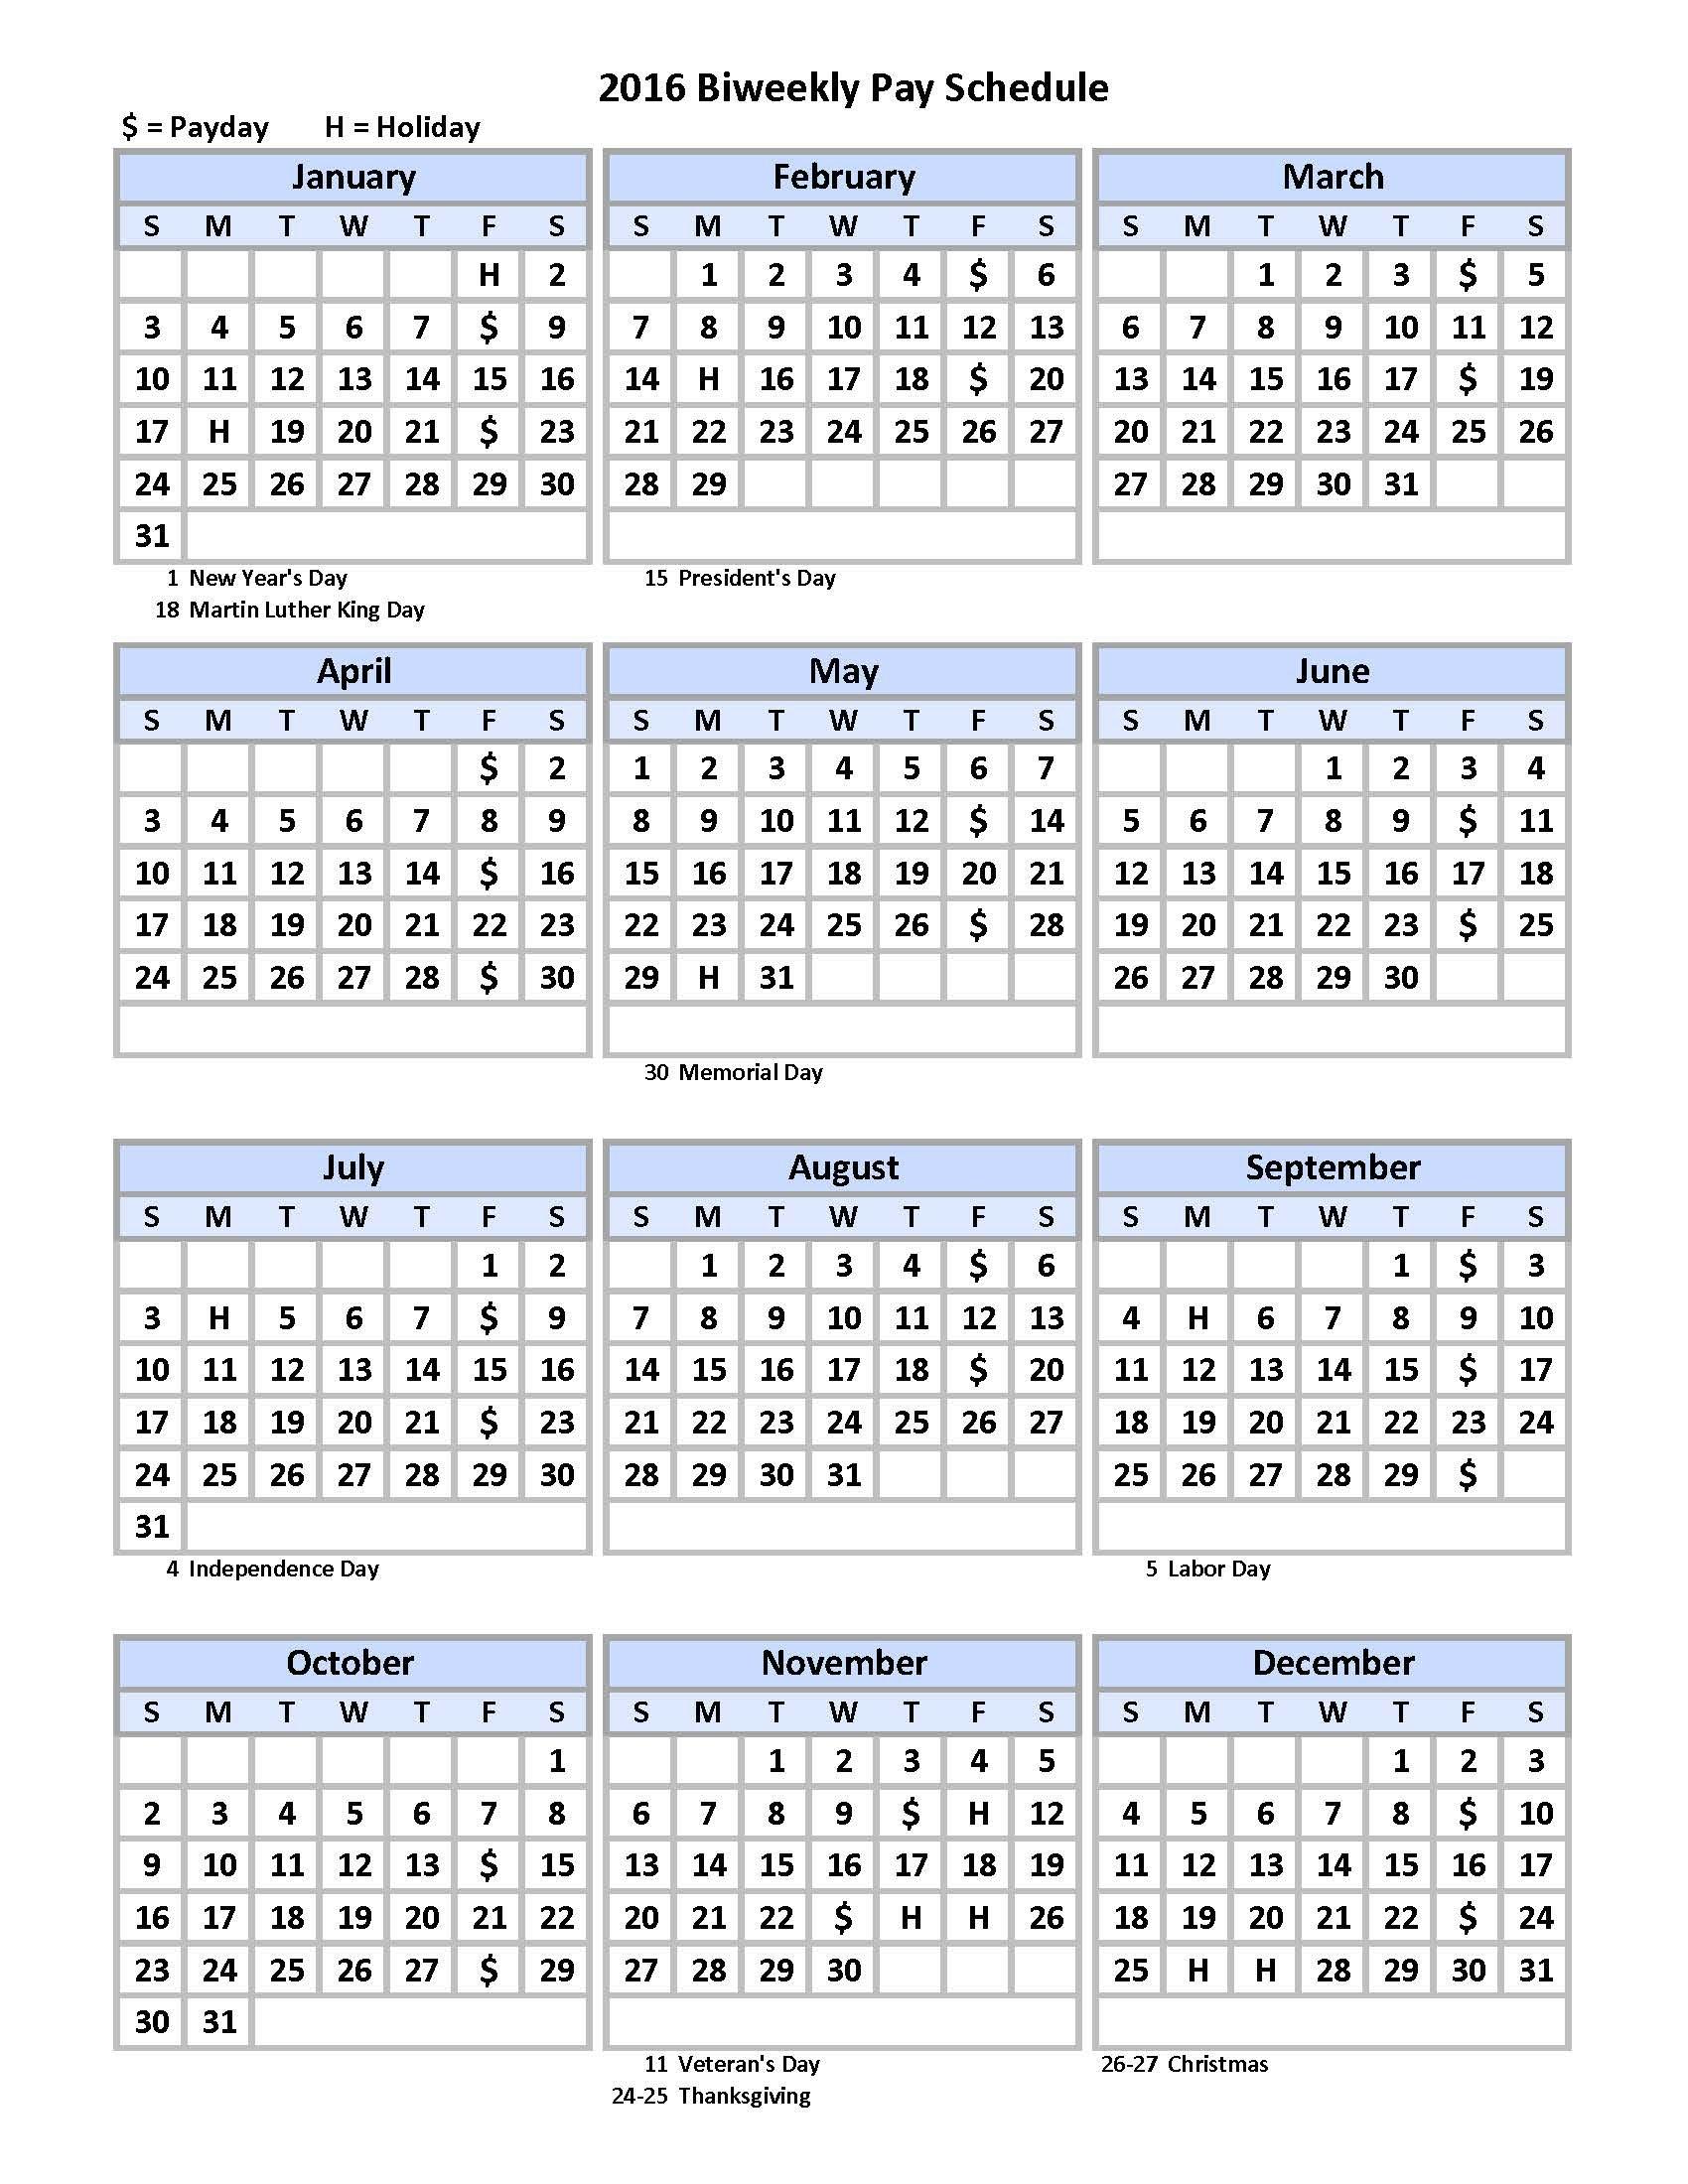 Biweekly Payroll Schedule Calendar Template - Pdf Format Example Of Editable Payroll Calendar